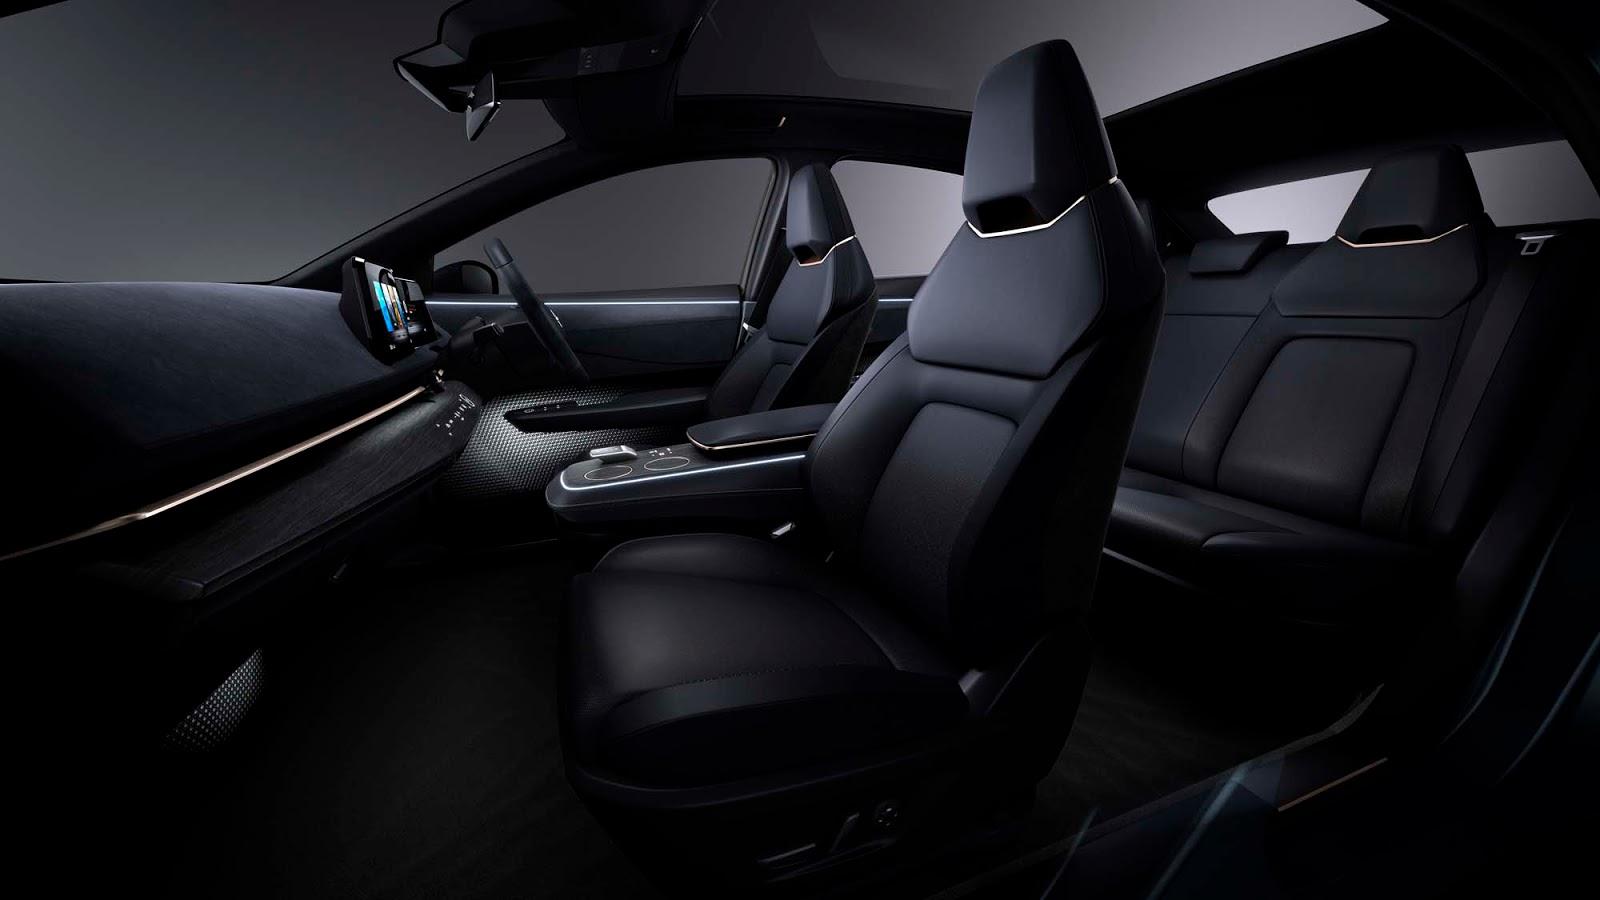 Nissan2BARIYA2BConcept 12 Με αυτό το μοντέλο η Nissan μας δείχνει το μέλλον της Electric cars, Nissan, Έκθεση, ιαπωνικά